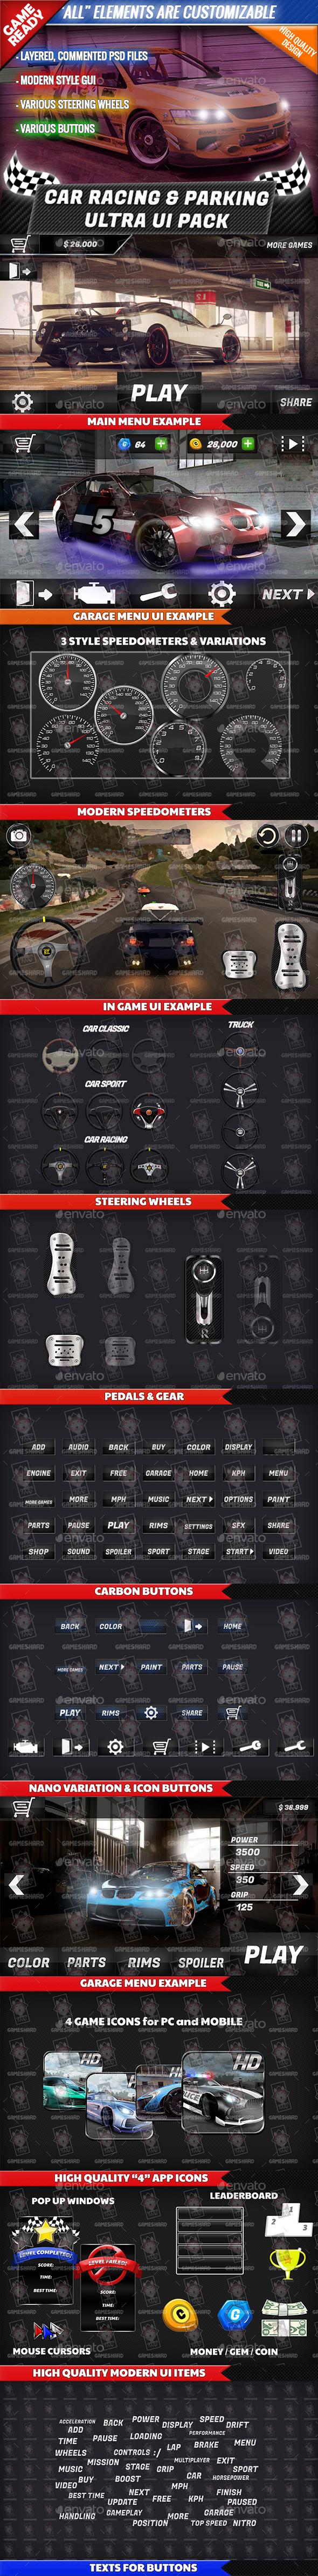 Car Racing & Parking Ultra UI Pack - Game Kits Game Assets